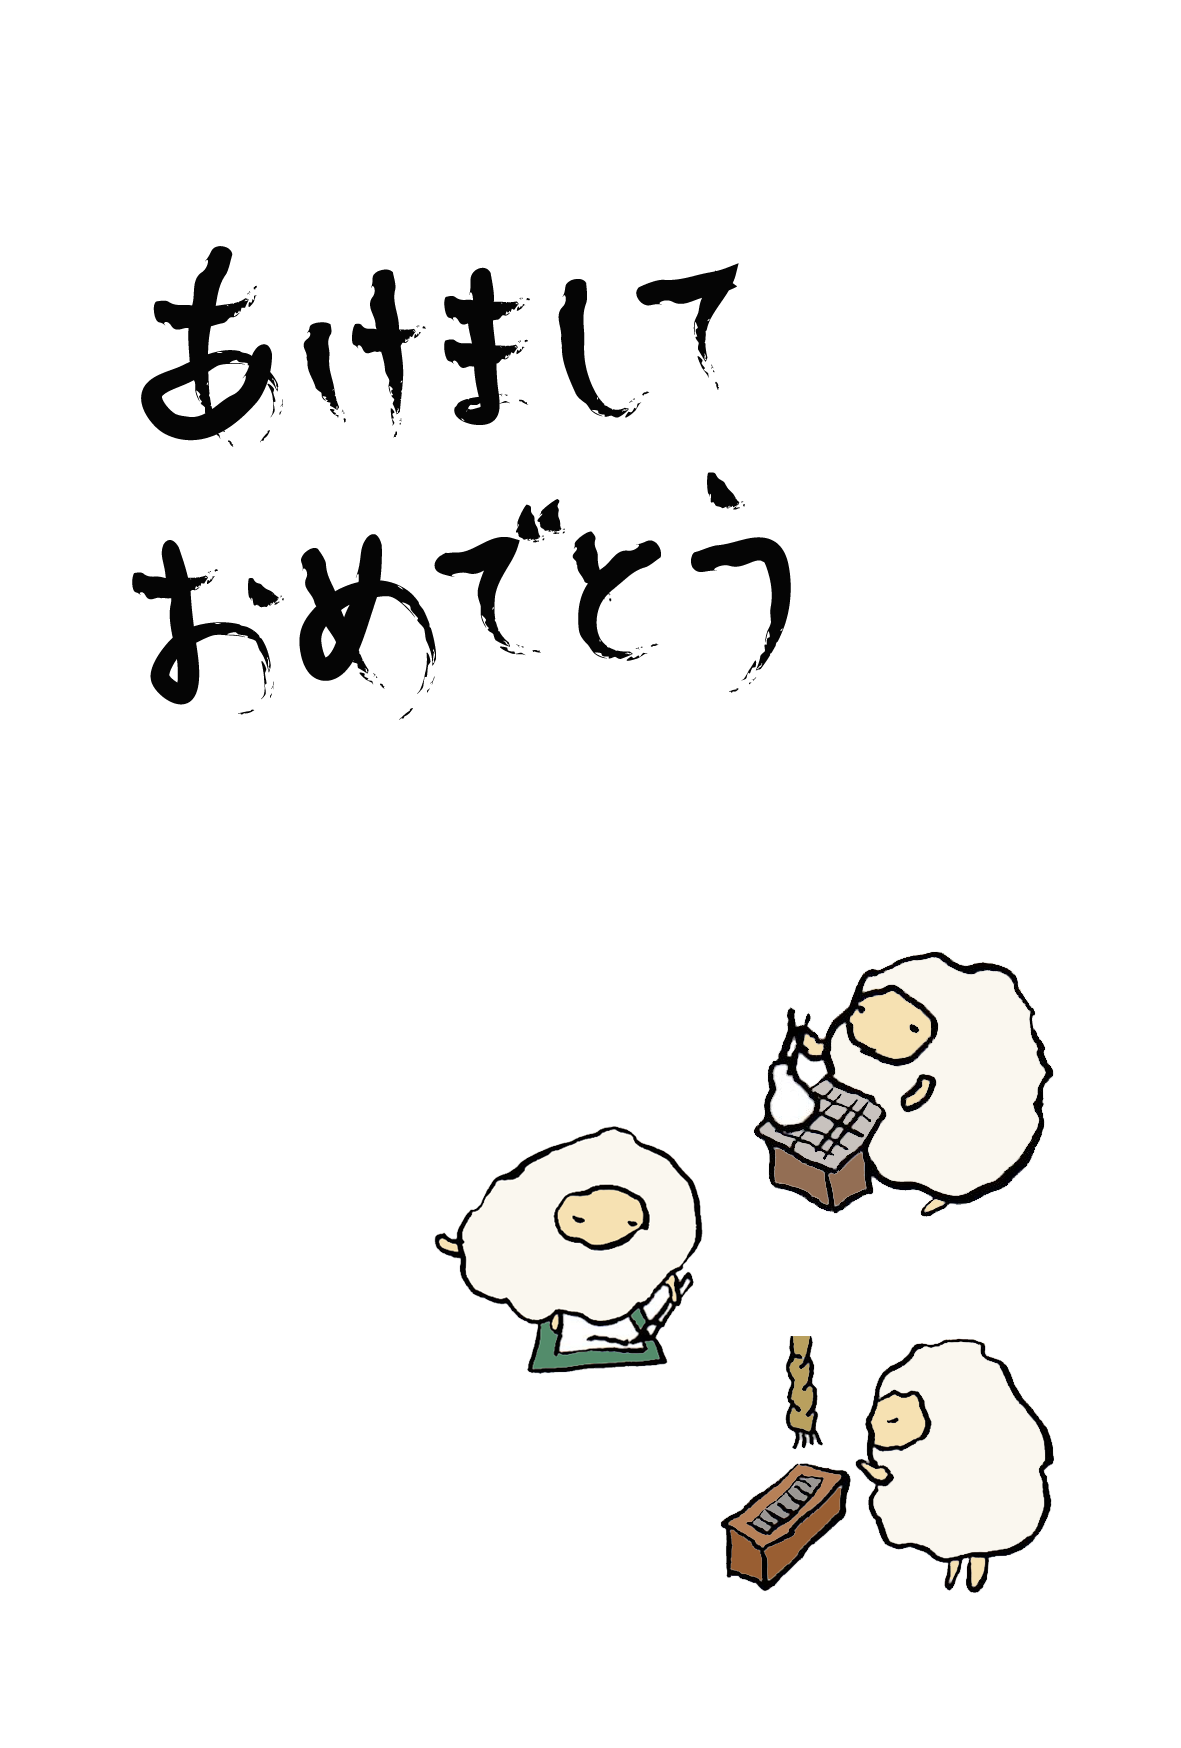 年賀状 年賀状 デザイン 無料 羊 : ... (羊)<無料>-和風